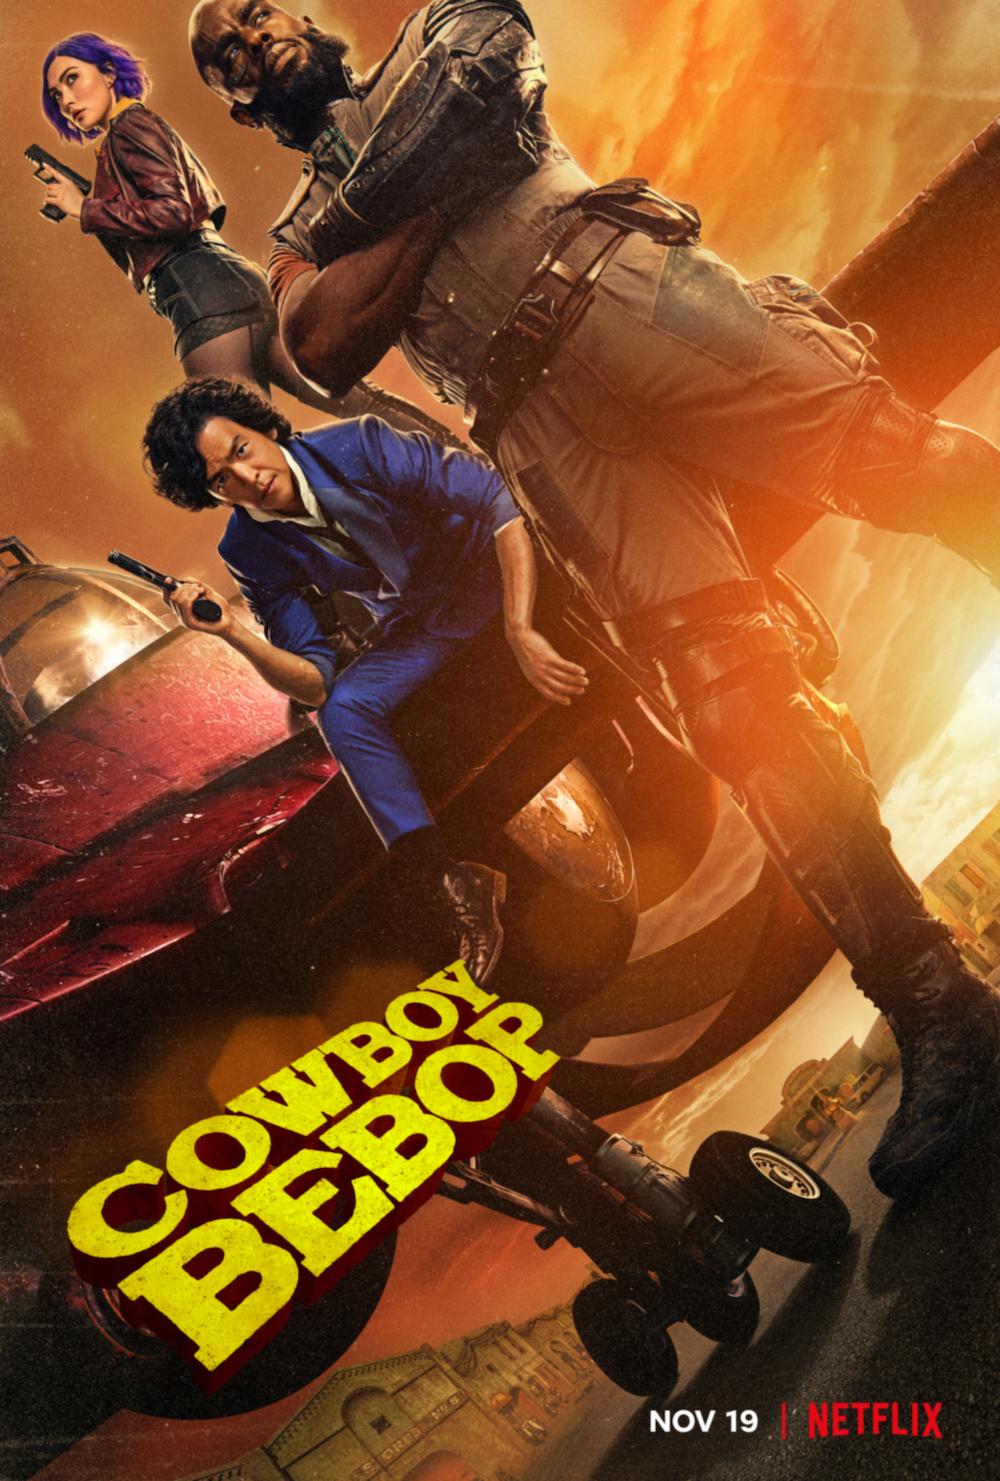 'Cowboy Bebop' Trailer: Netflix's Live-Action Adaptation of Classic Anime Draws Near